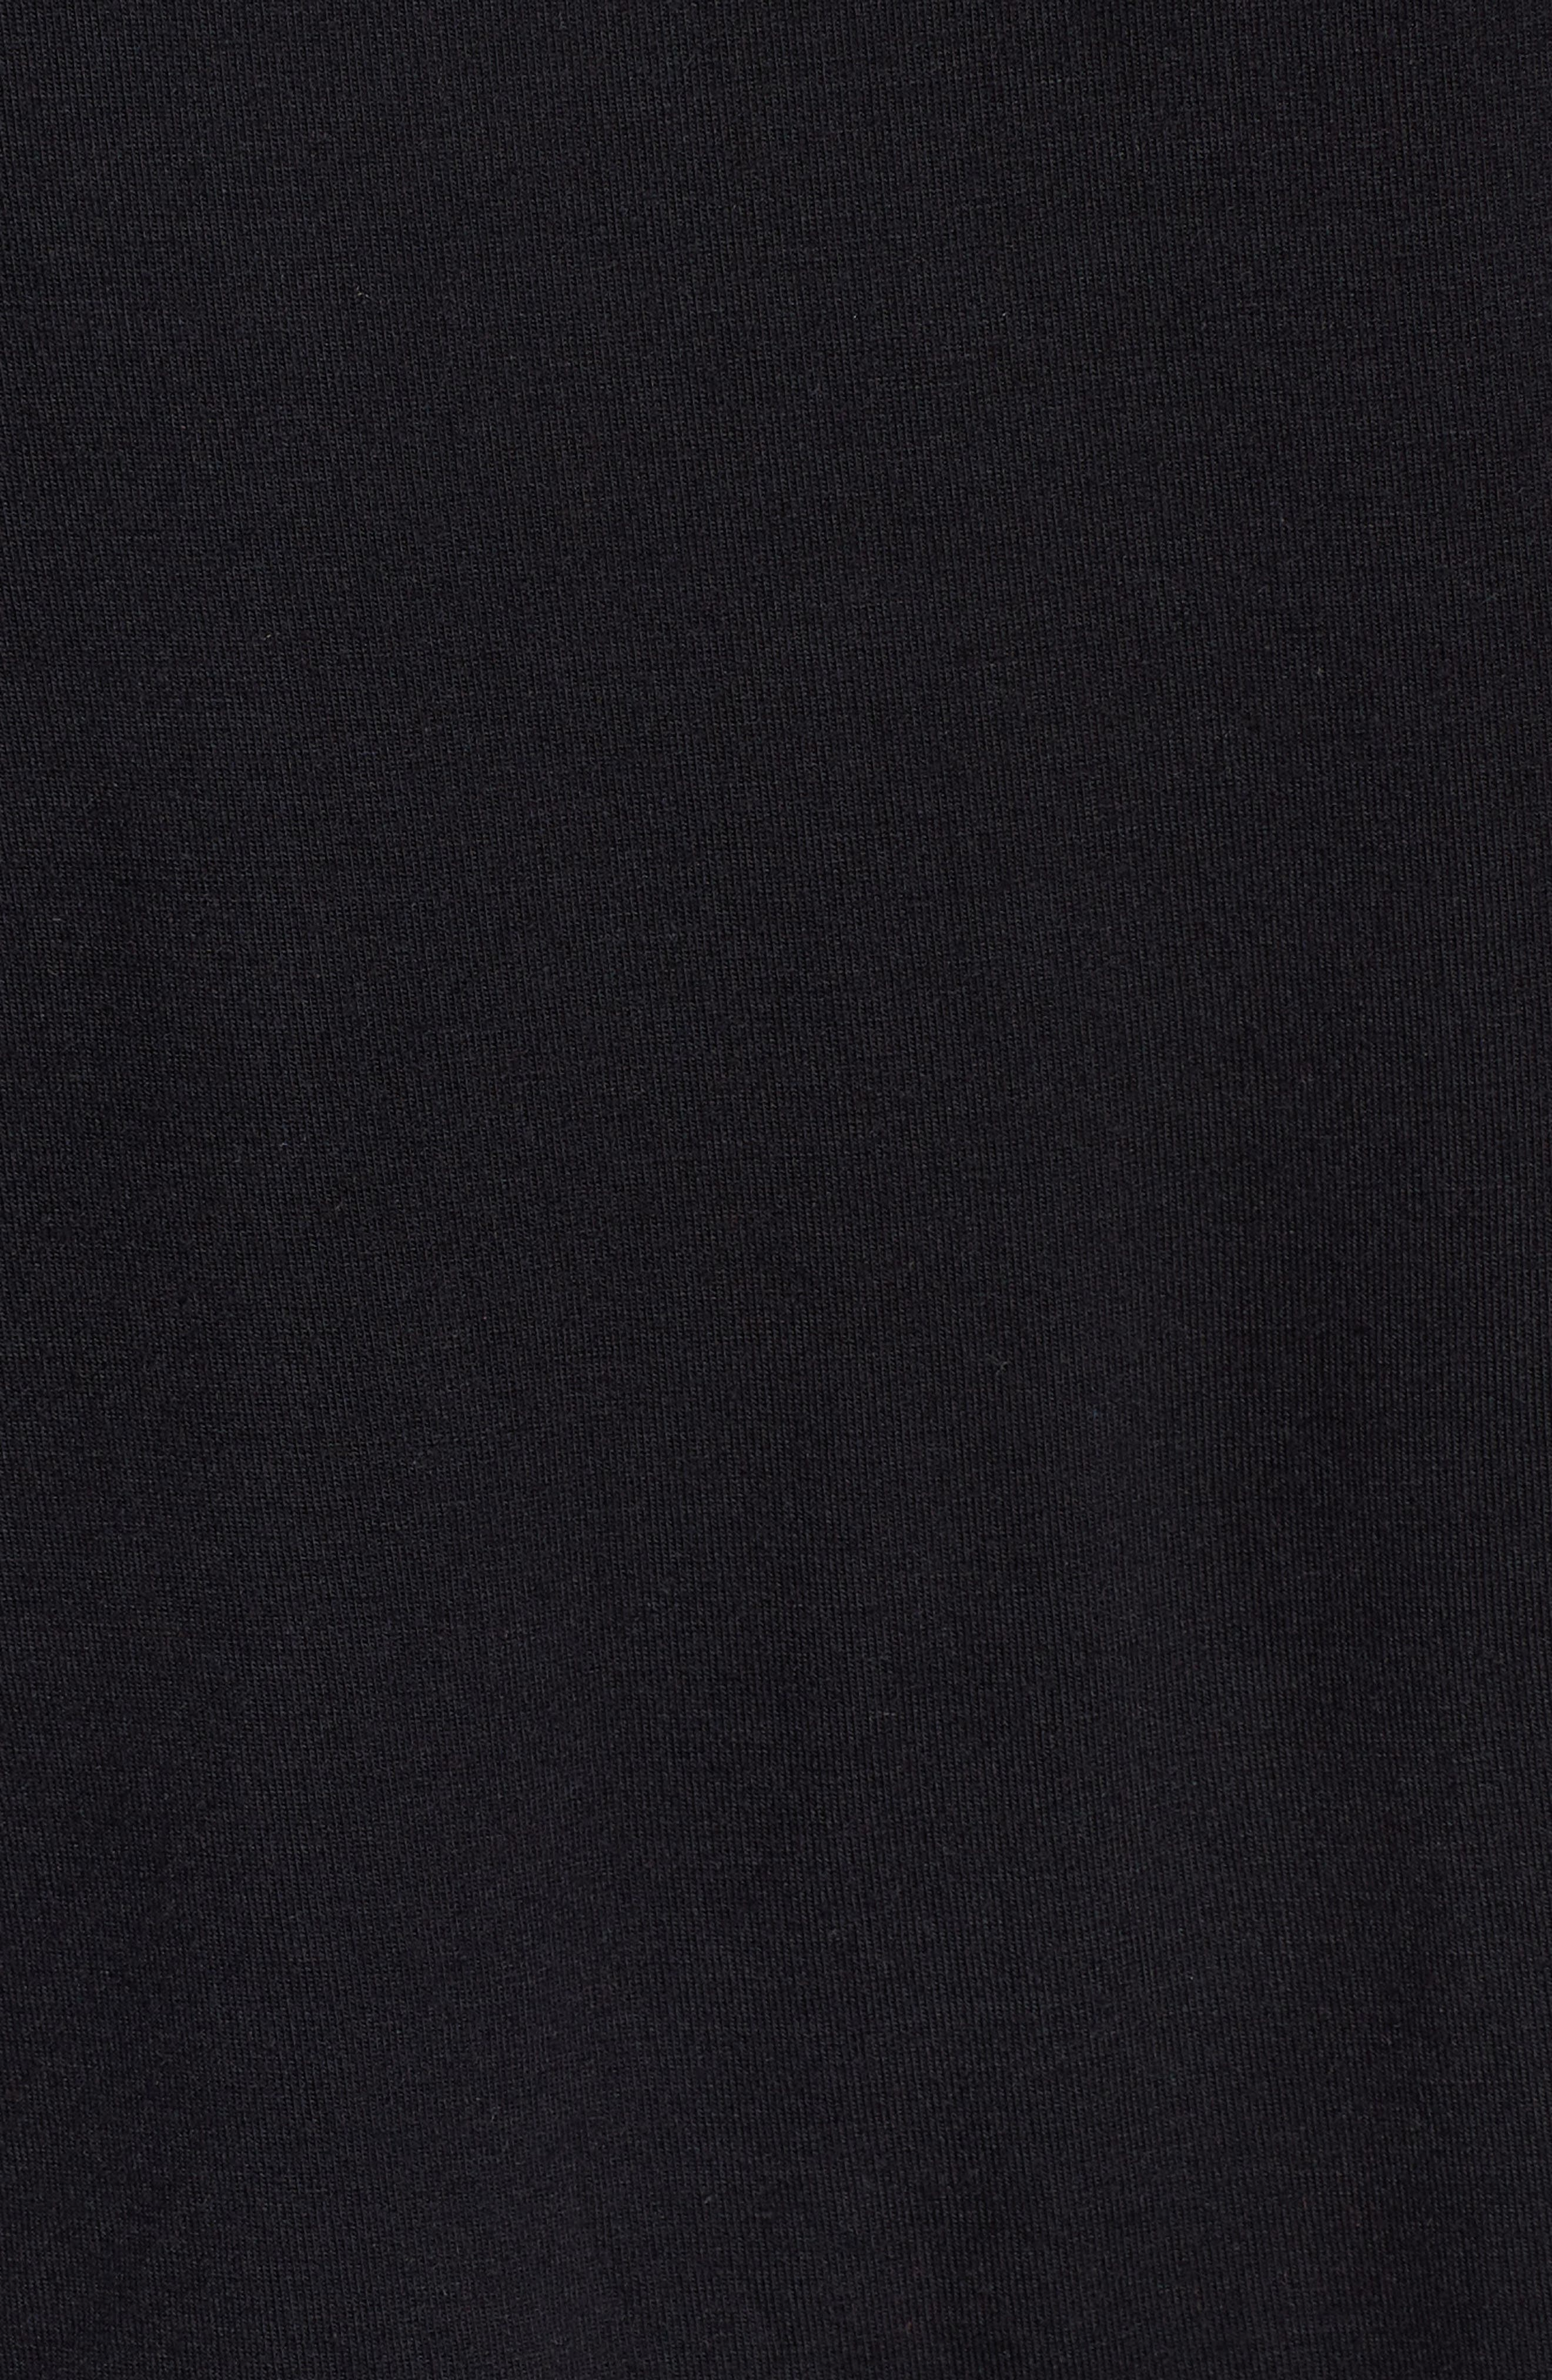 Karen Knit Top,                             Alternate thumbnail 5, color,                             001